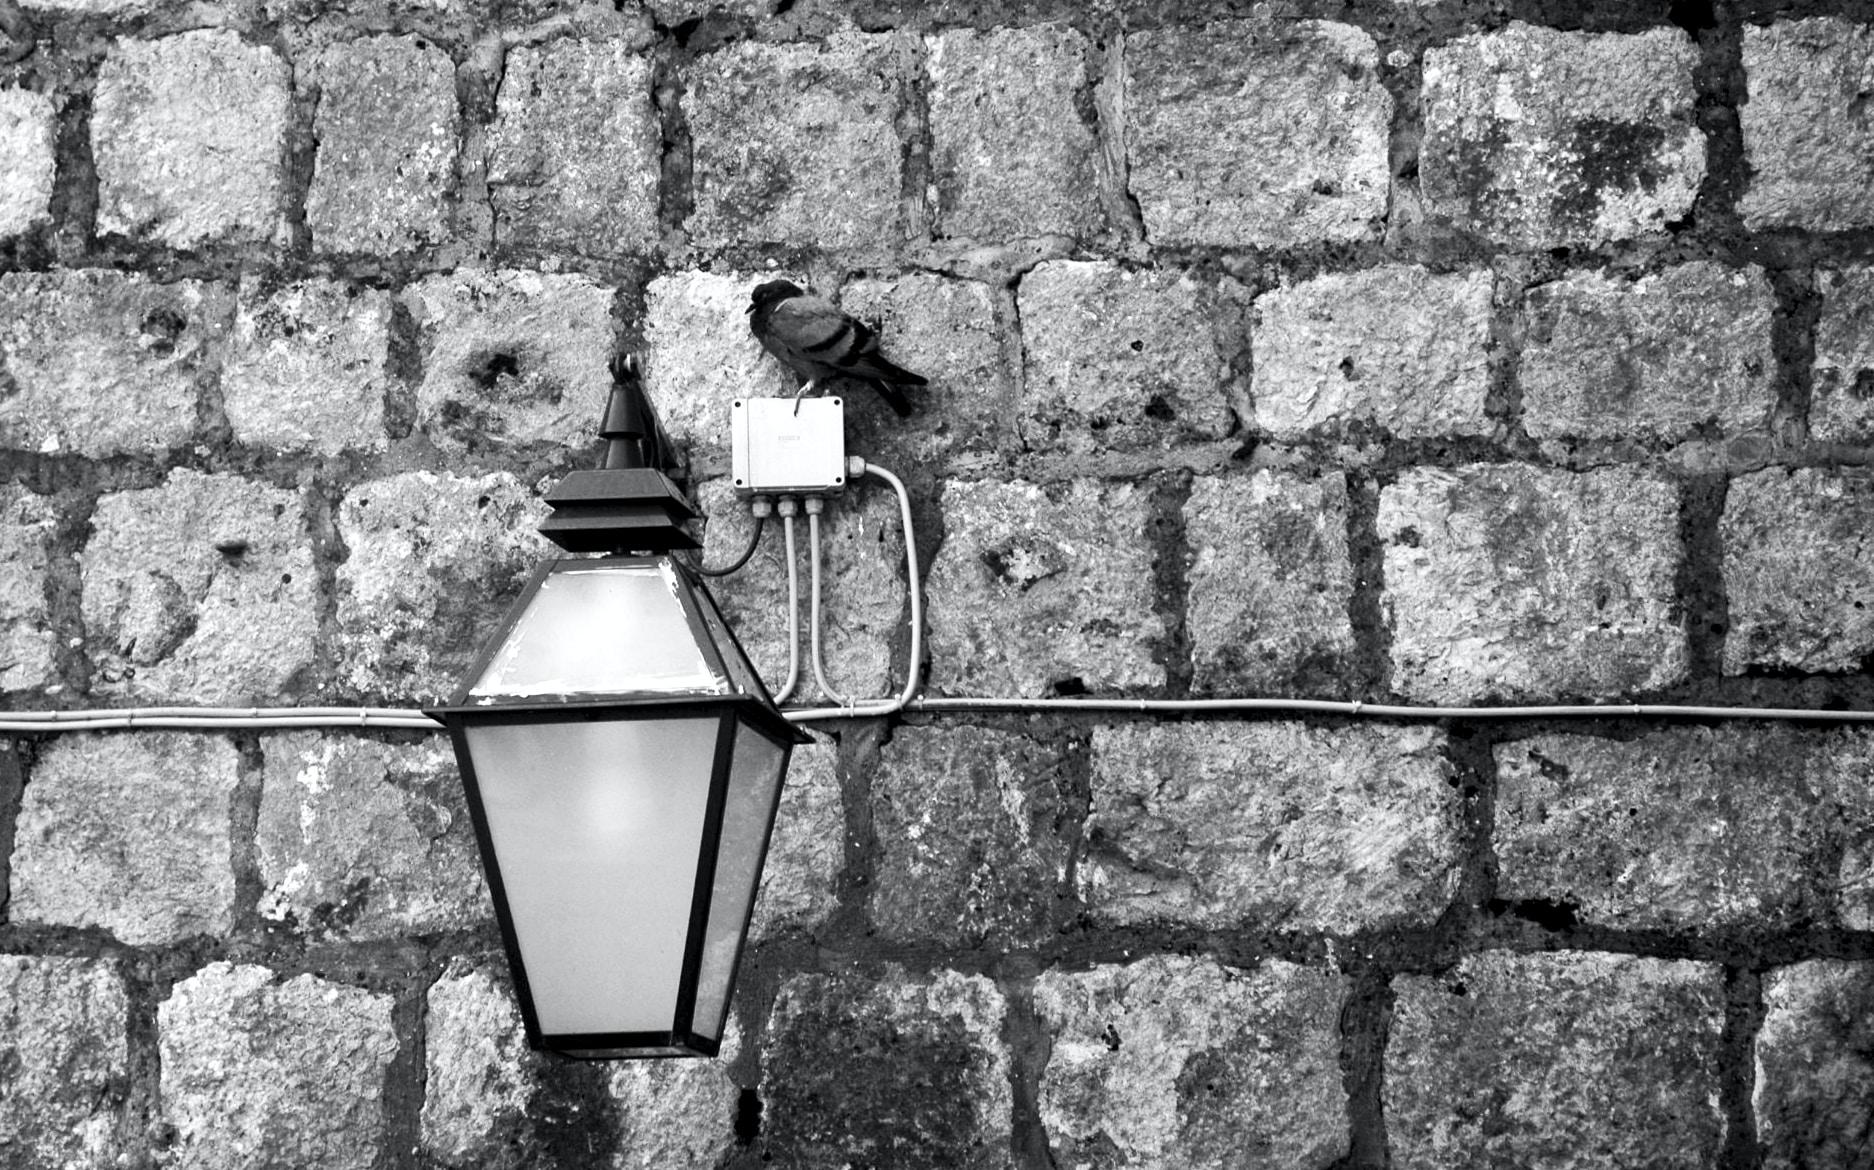 Free Unsplash photo from Mevan Babakar